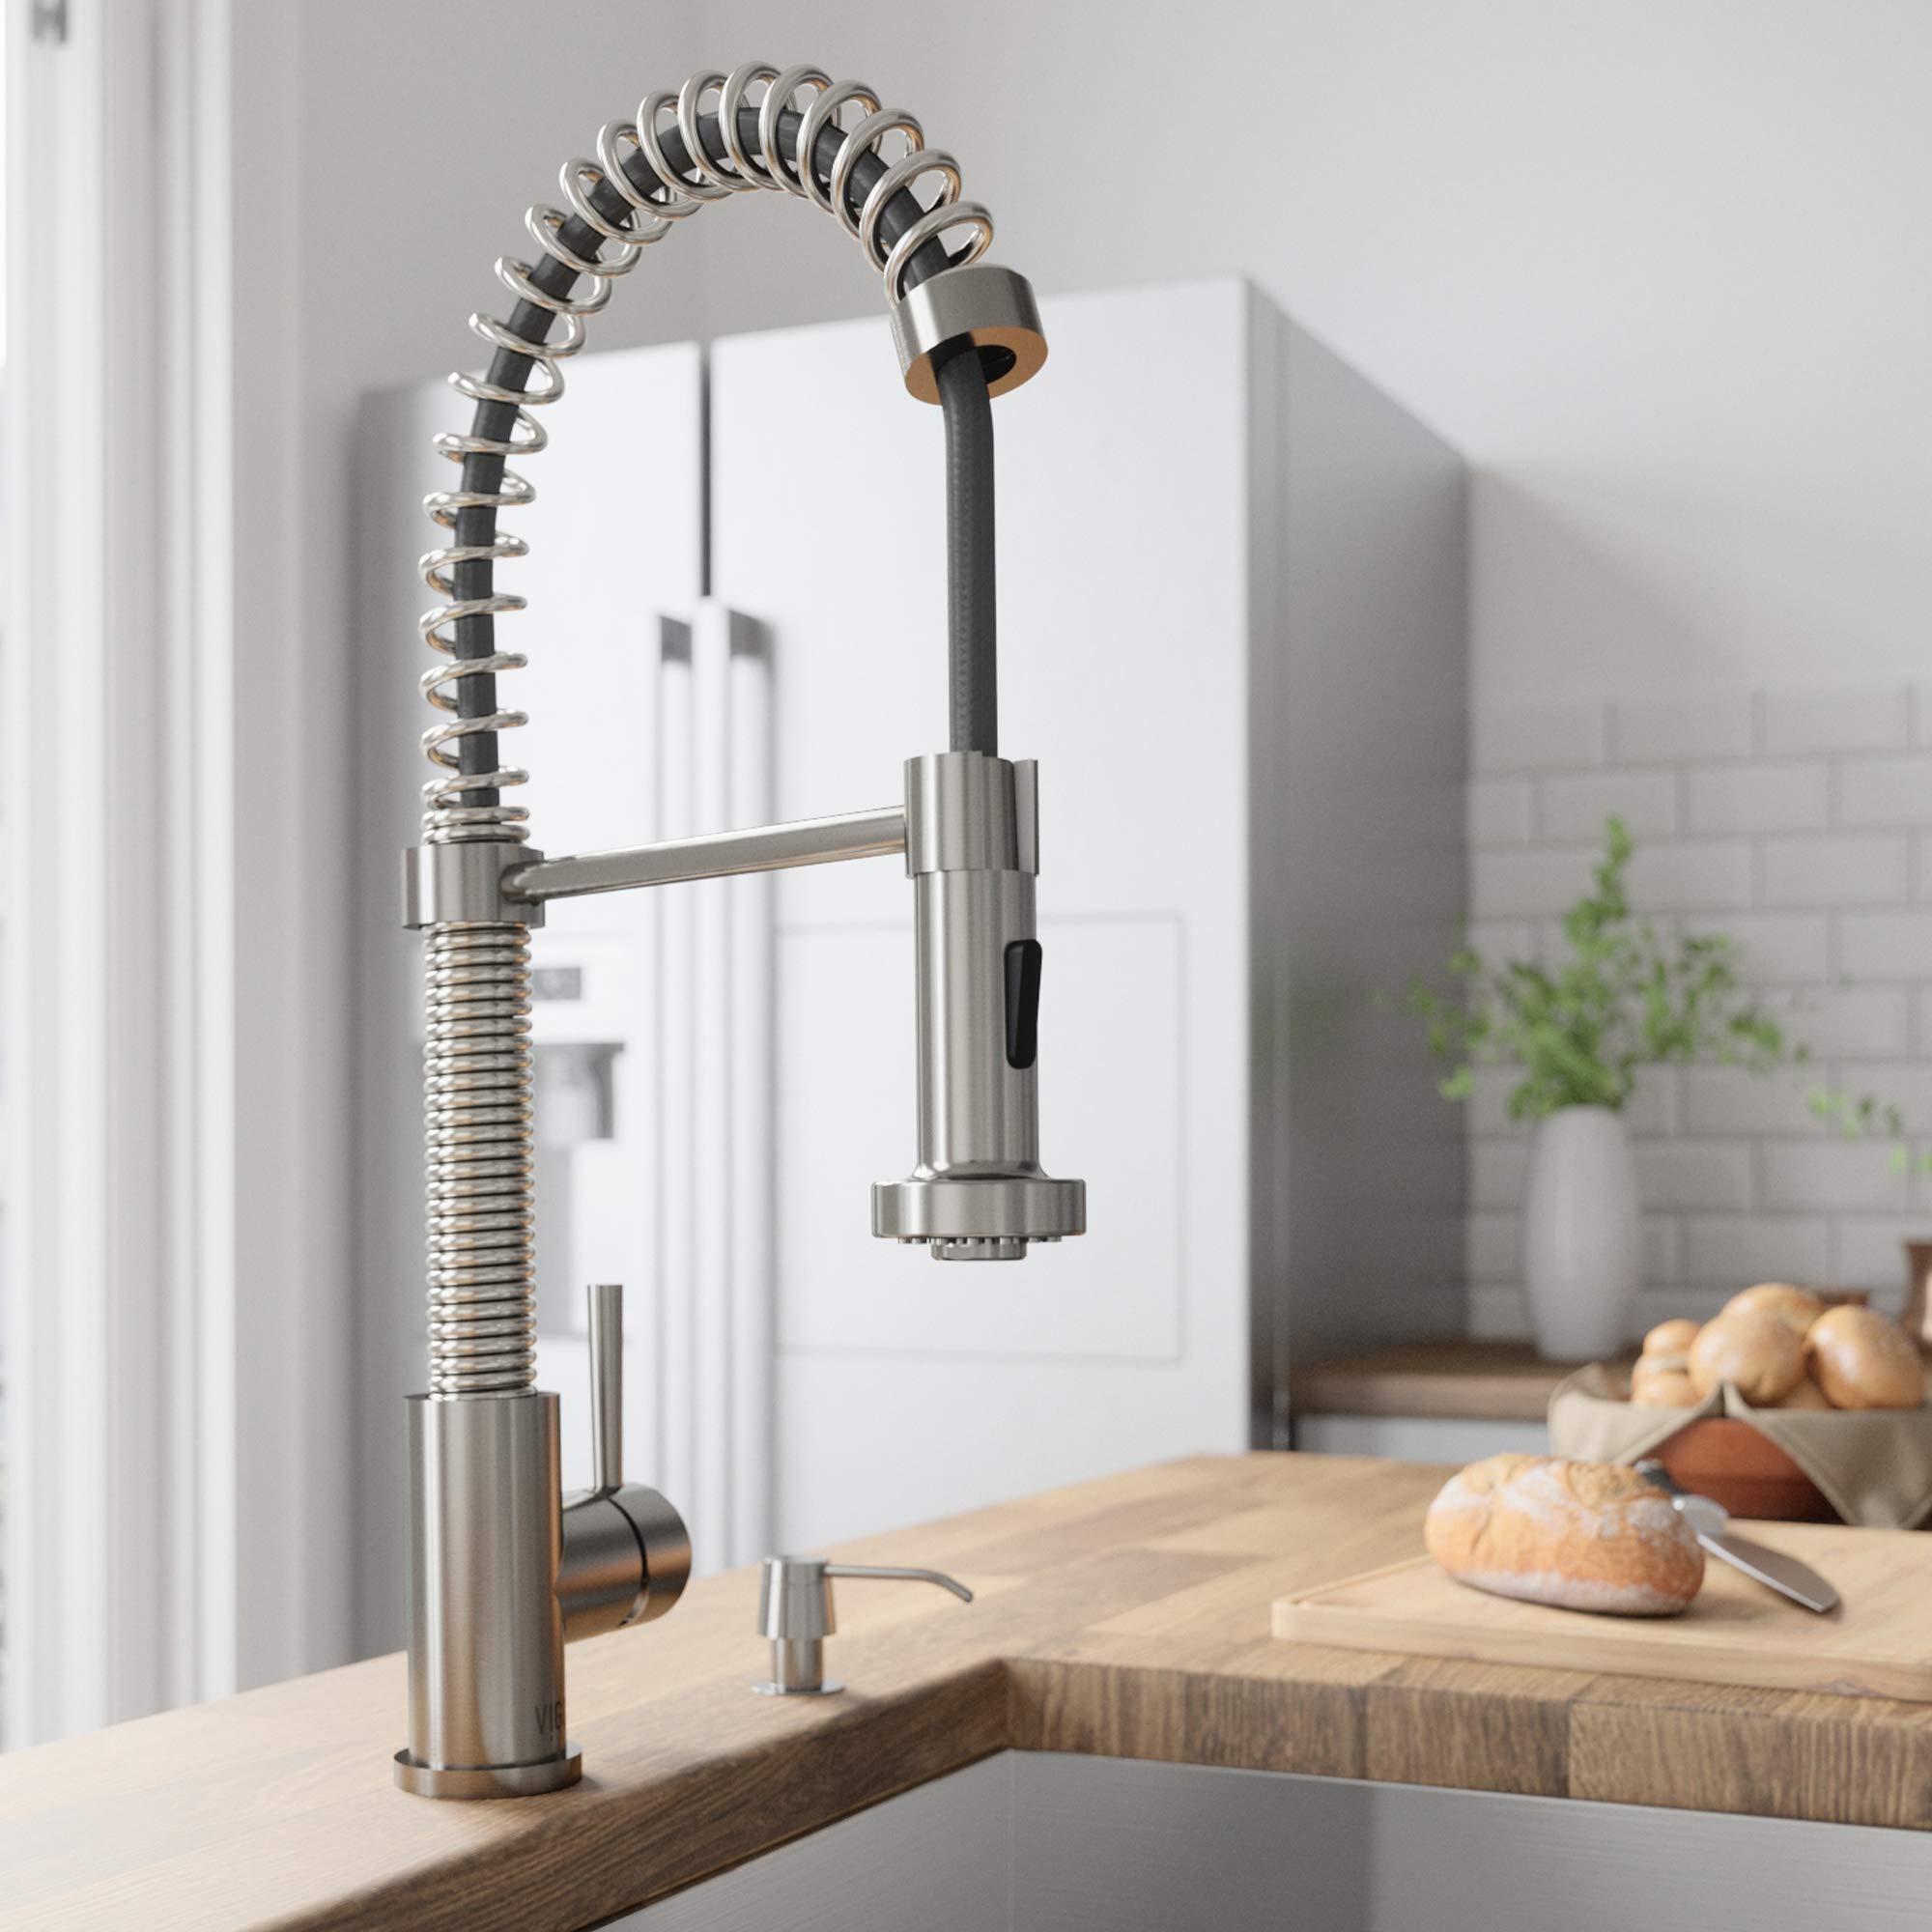 VIGO VG02001ST Edison Brass Single Handle Pull Down Sprayer Kitchen Sink Faucet, Centerset Single Hole Faucet, Swivel Head Design, Plated Stainless Steel Finish